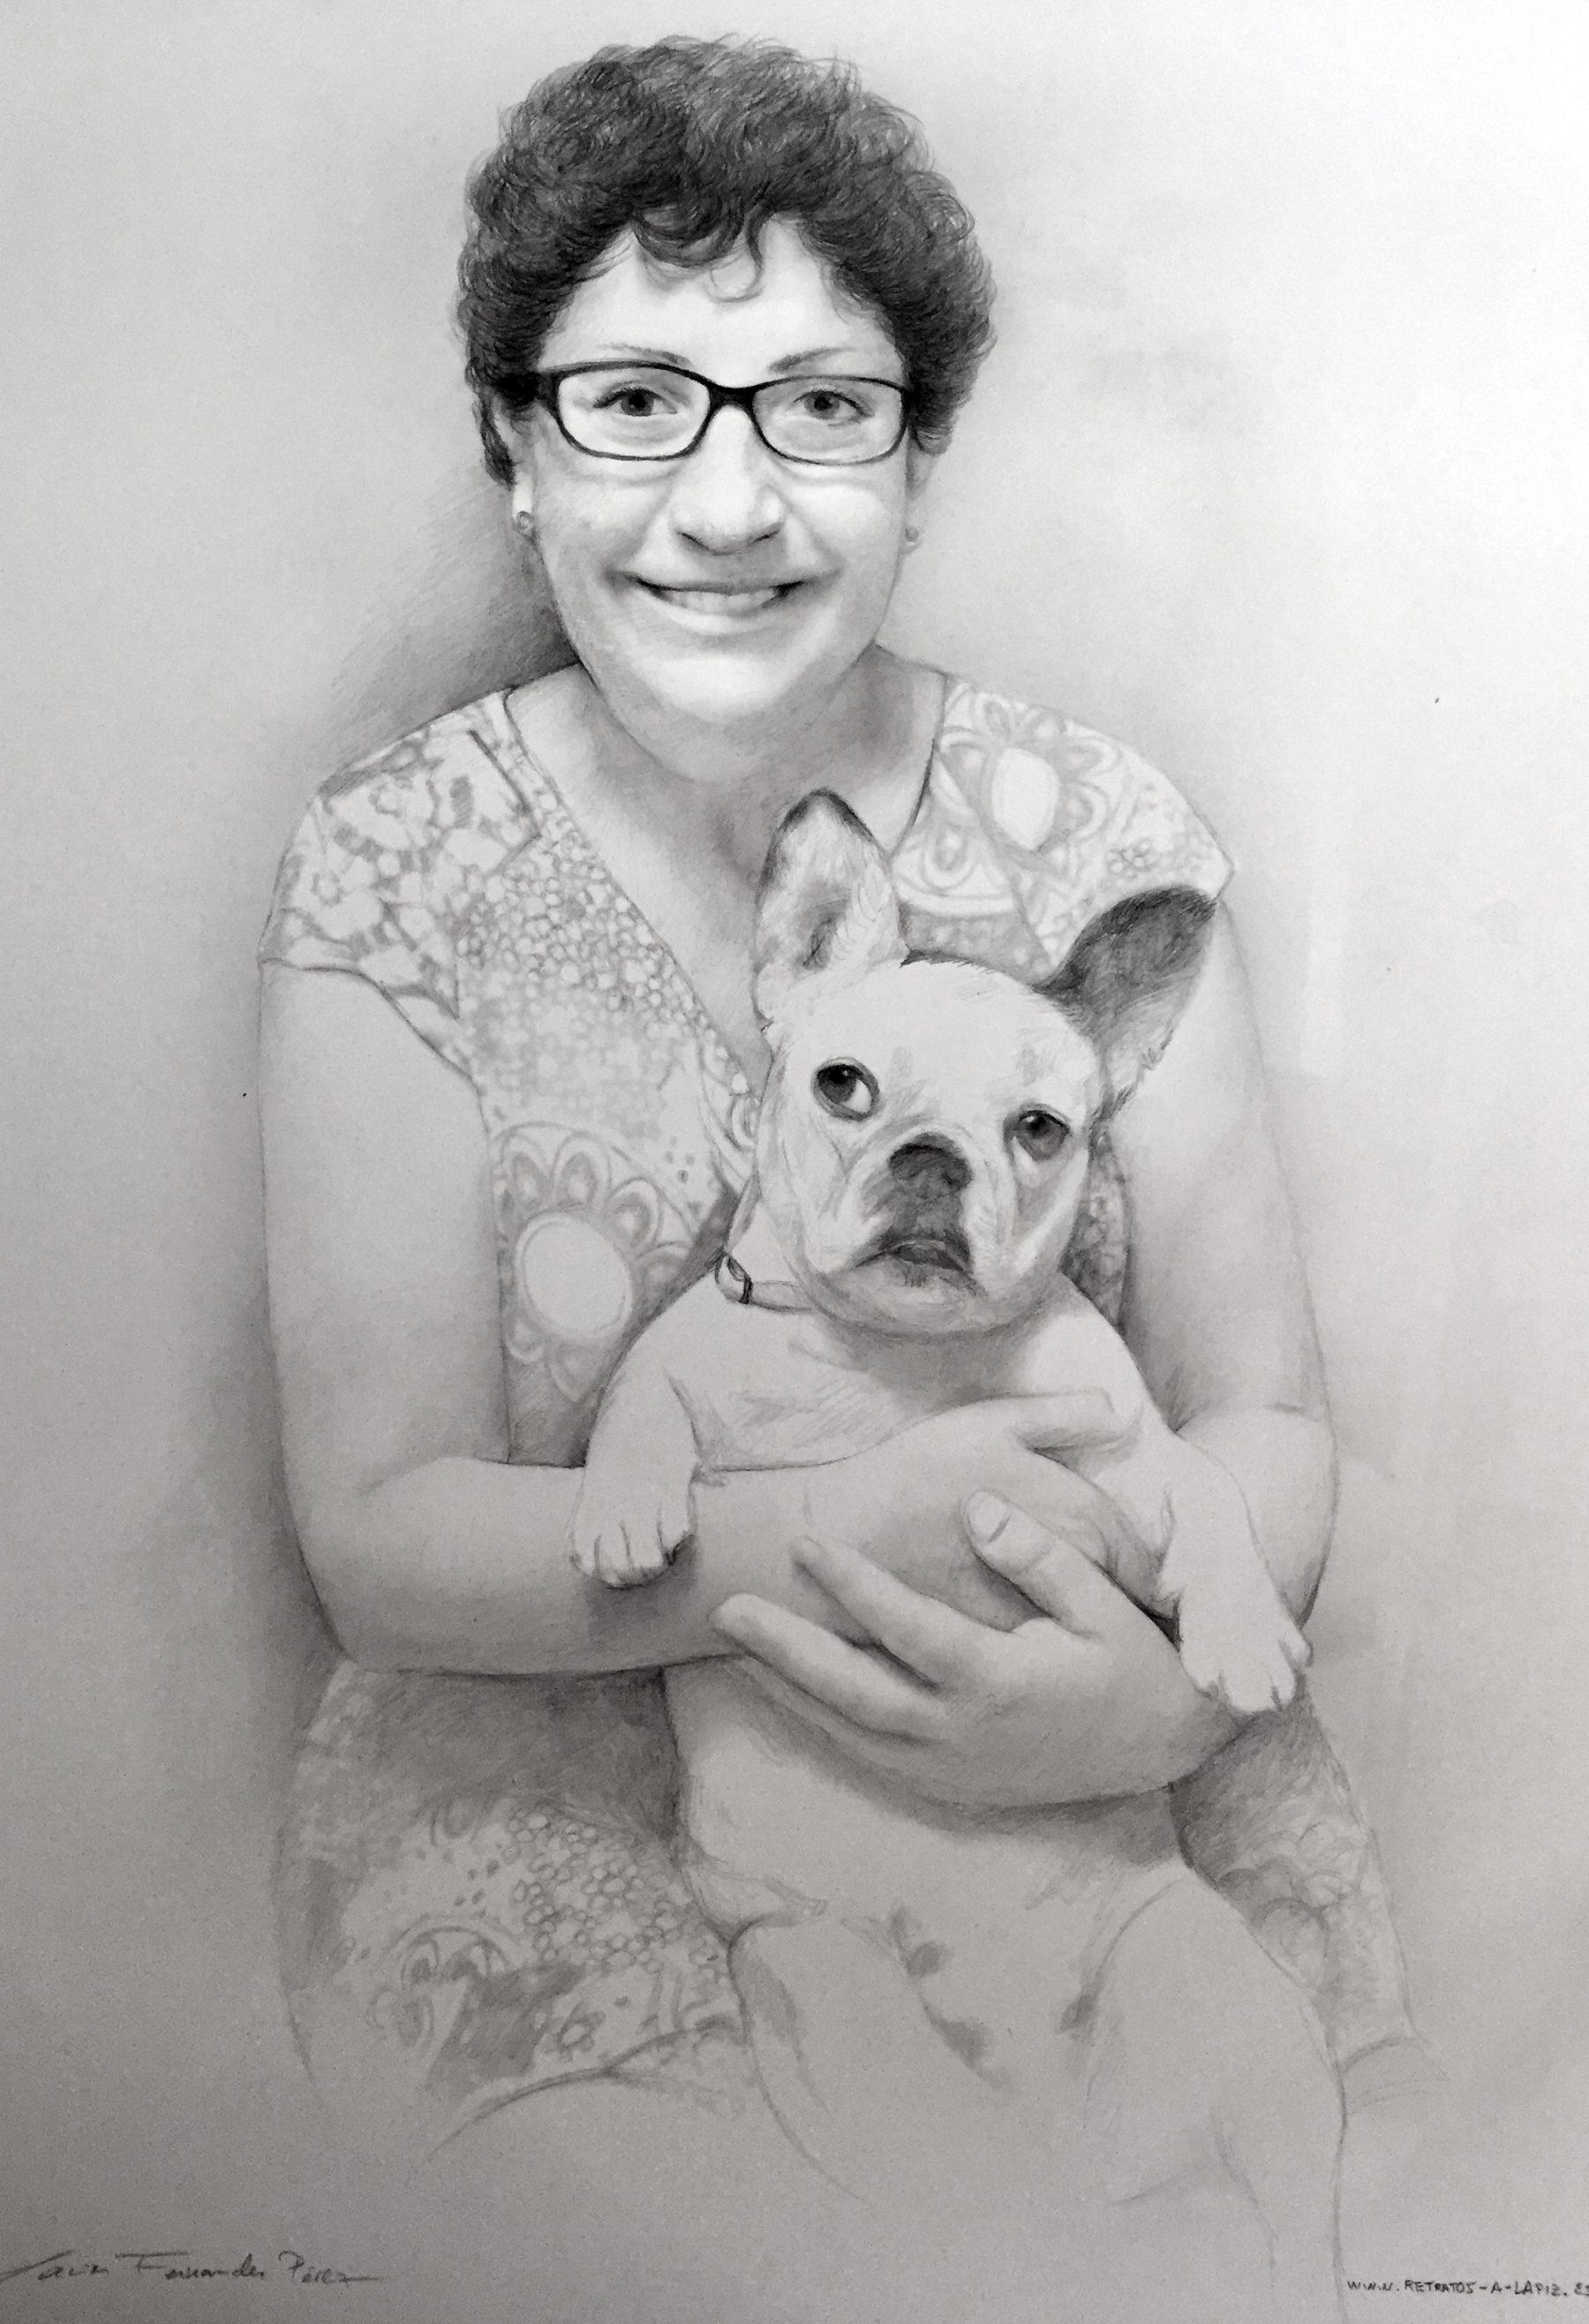 retrato-de-perro-e1488759043362